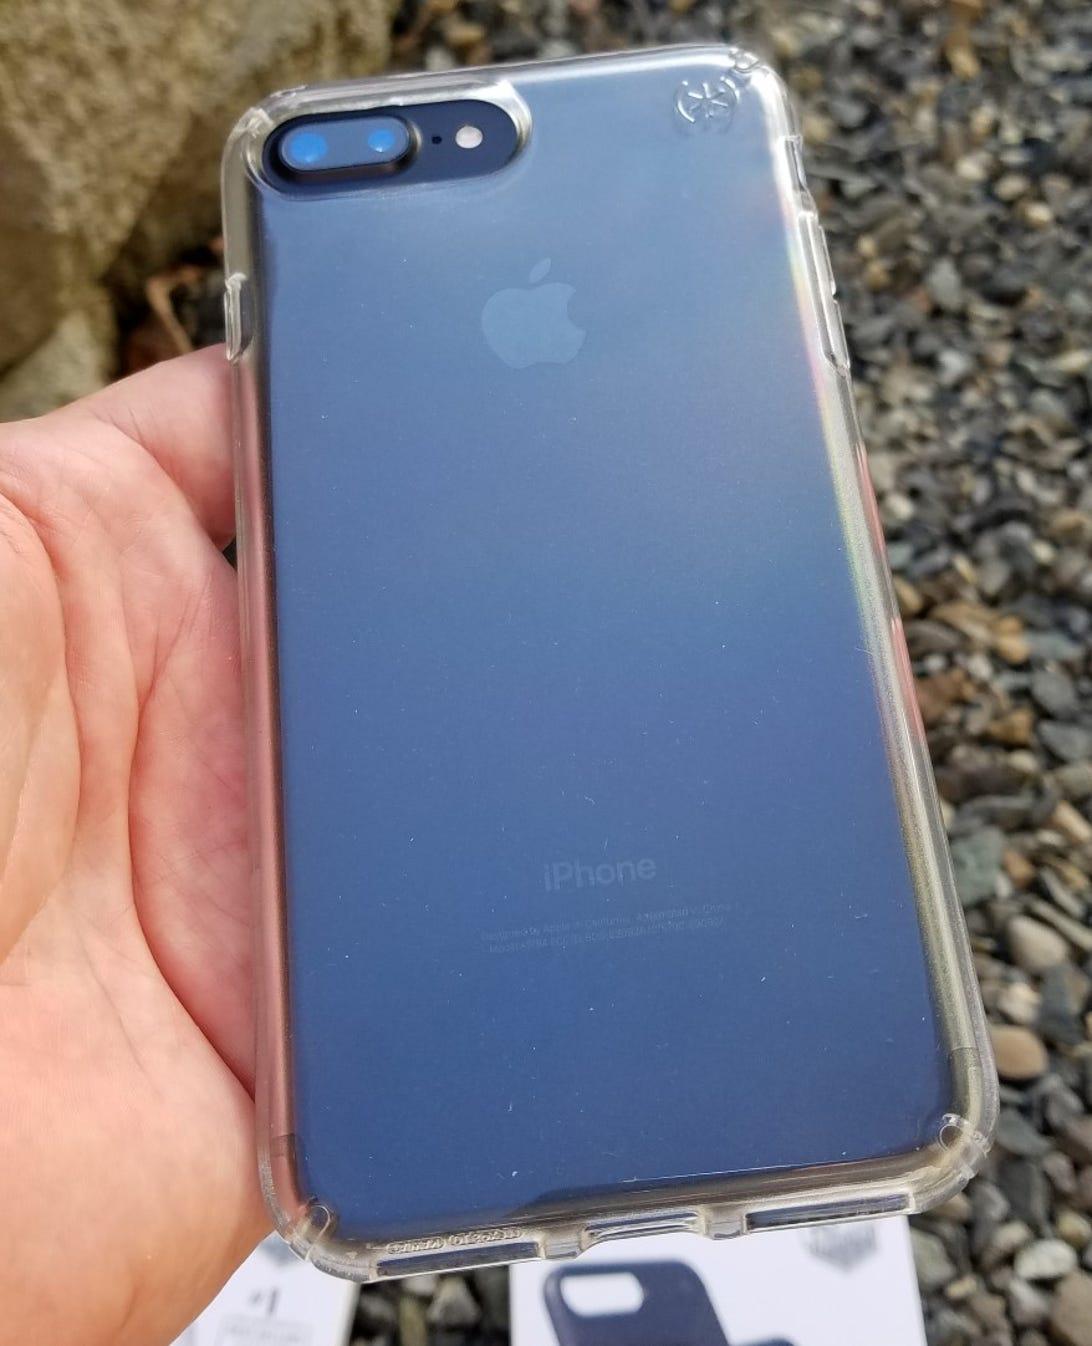 speck-iphone-7-plus-17.jpg